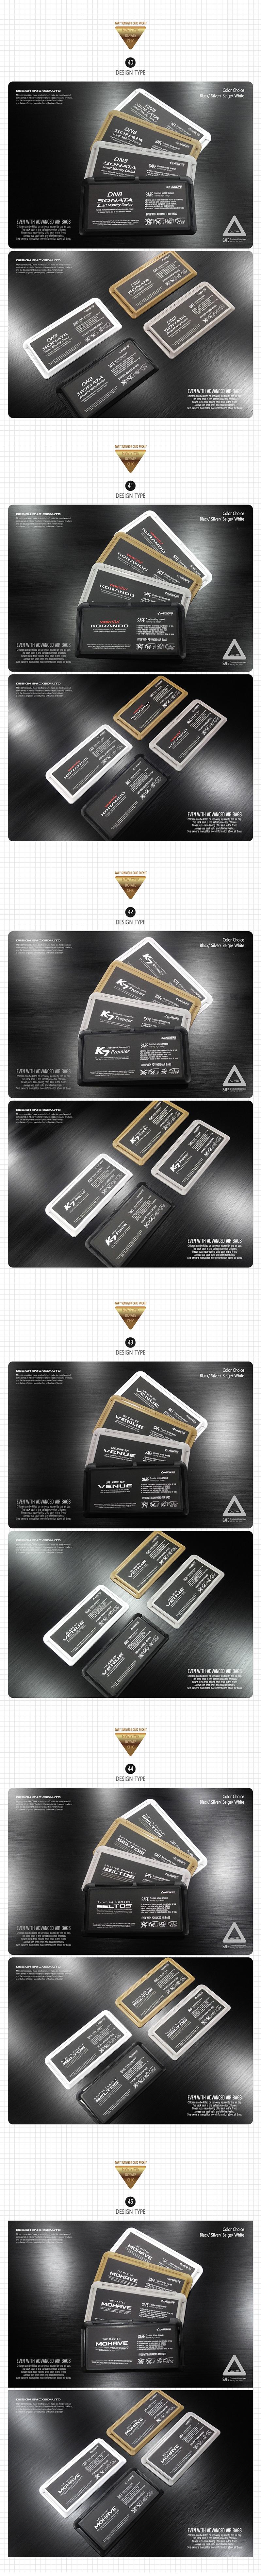 [DXSOAUTO] 커스터마이징 4WAY 썬바이저 카드포켓 (1EA / 1SET) 셀토스